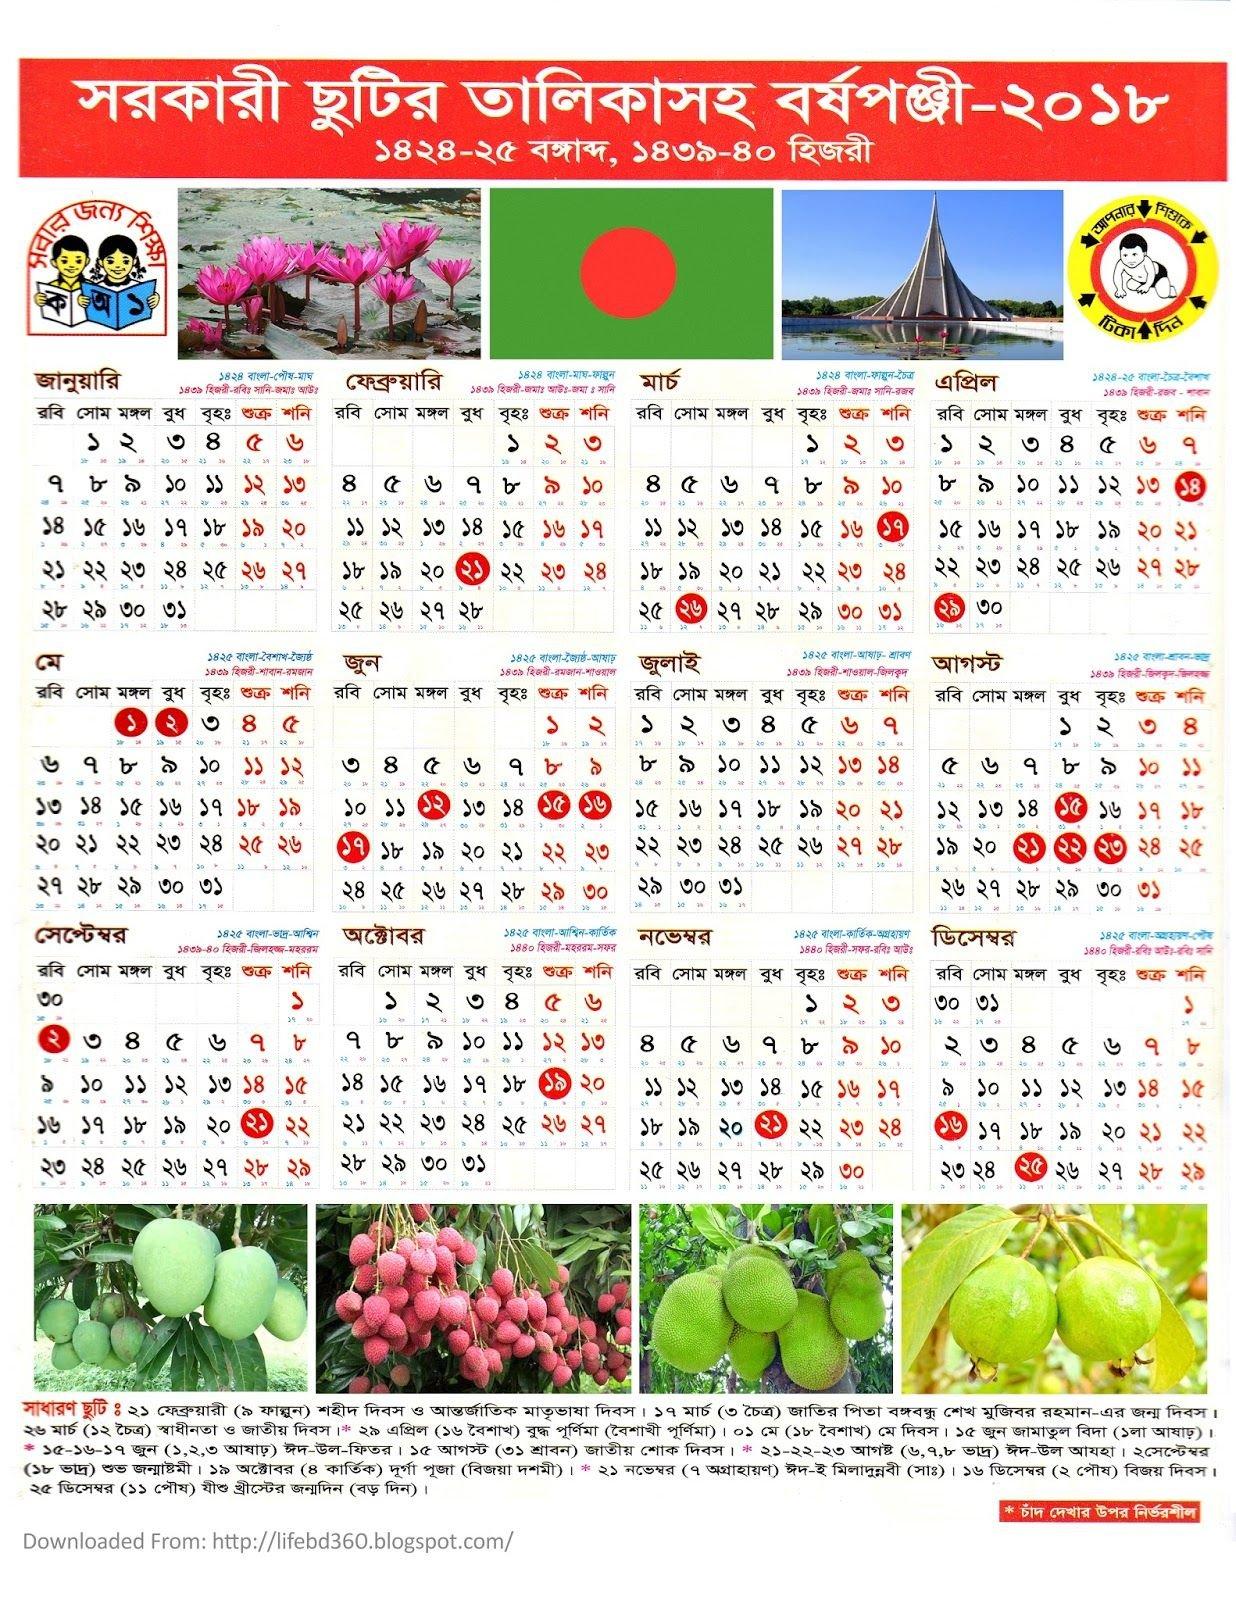 Download Printable Pdf Of Bangladesh Government Holiday Calendar Calendar 2019 Government Holidays